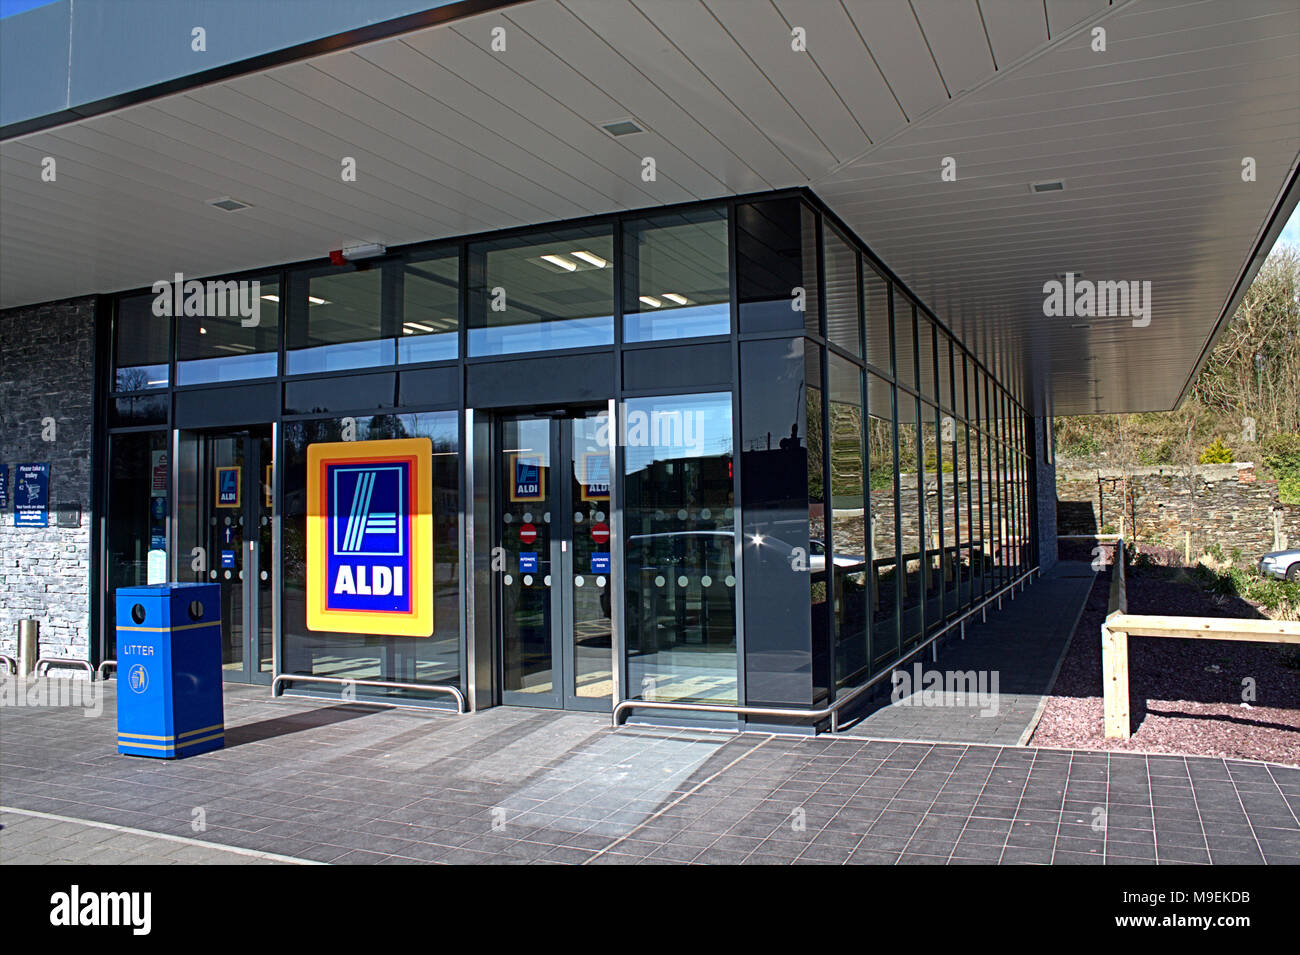 aldi-supermarket-in-skibbereen-ireland-M9EKDB.jpg